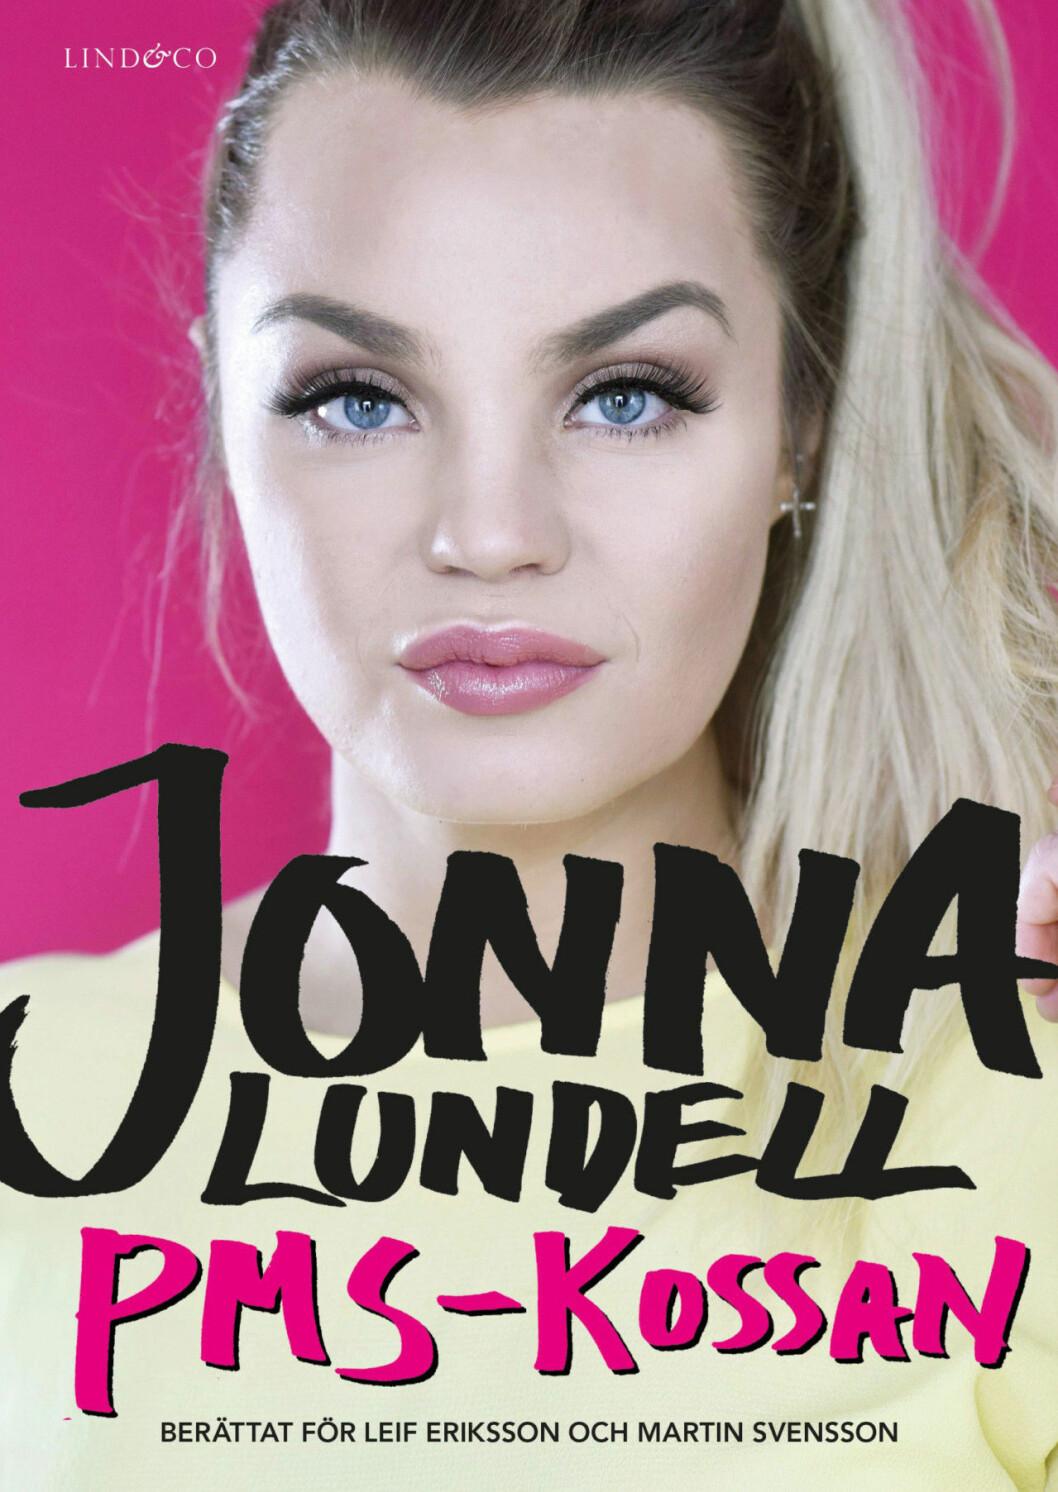 Jonna-Lundell-intervju-PMS-kossan